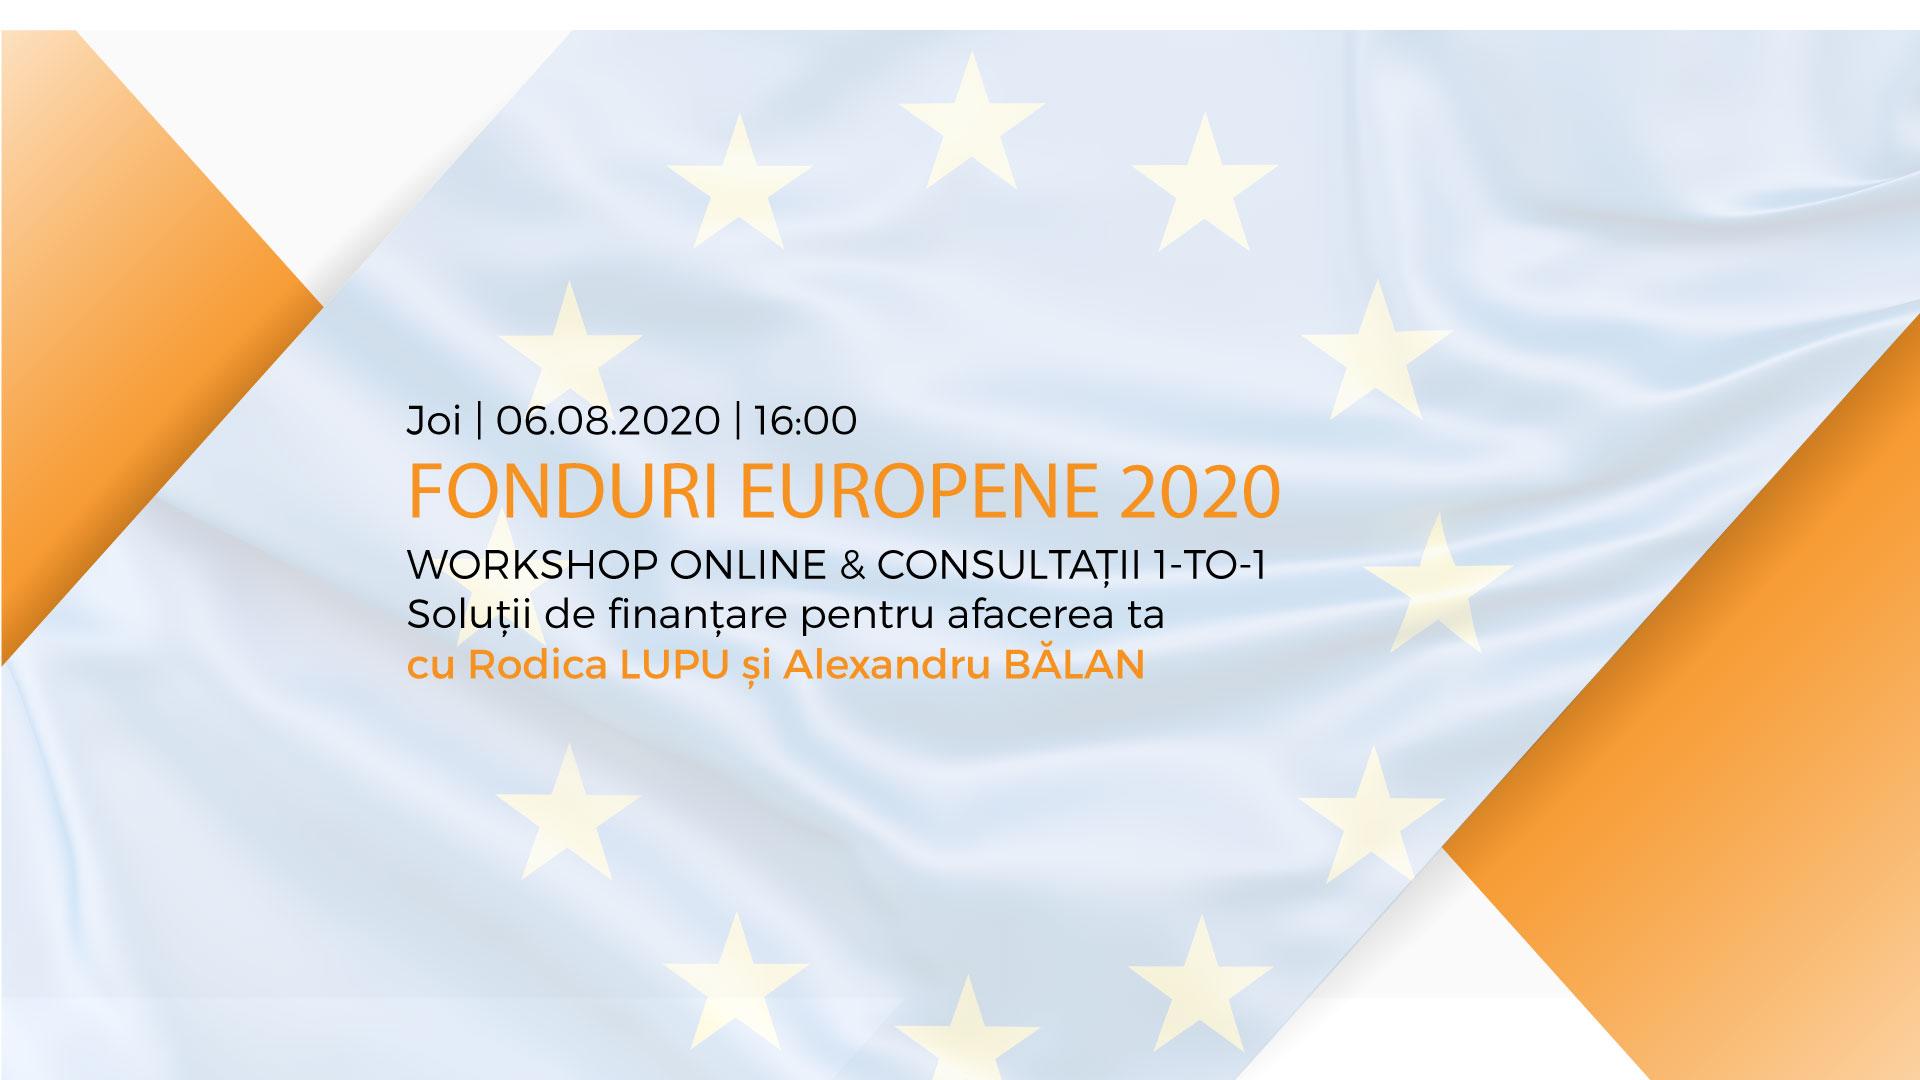 webinar-fonduri-europene-5 august-2020